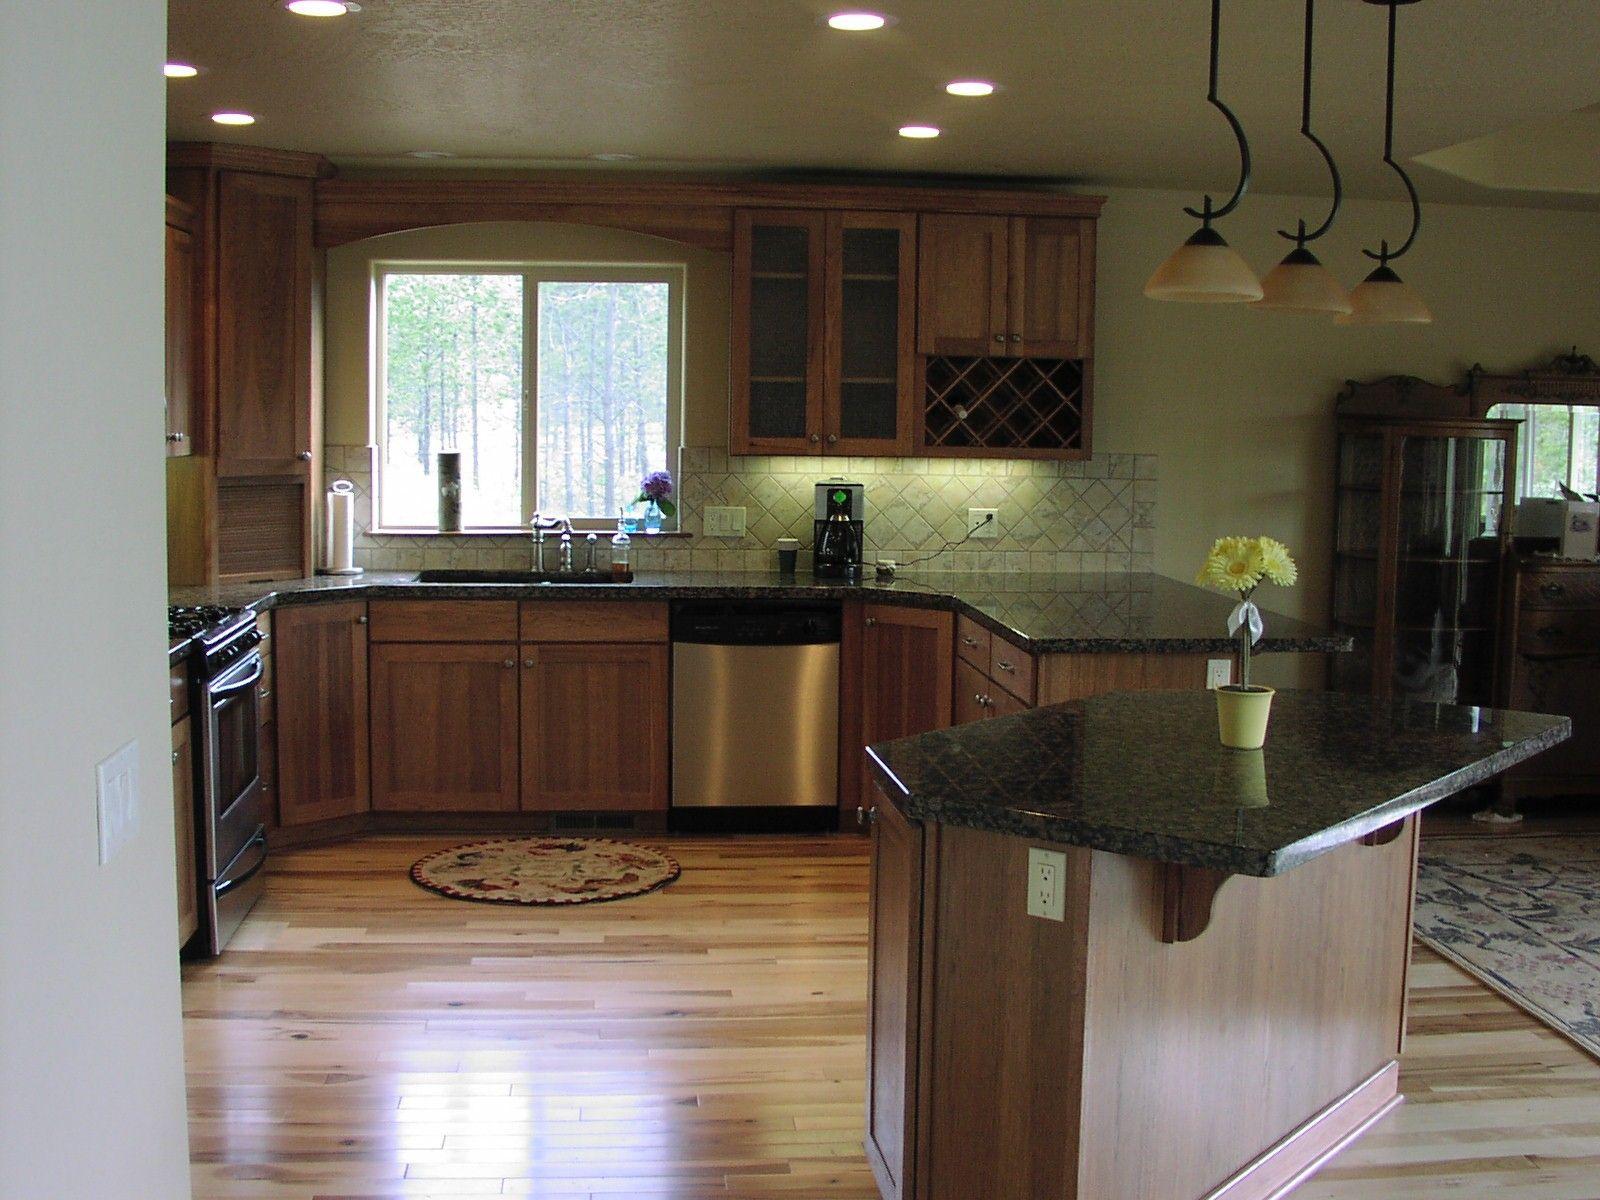 Kitchen Countertops Design With Sweet Dark Granite ... on Dark Granite Countertops With Dark Cabinets  id=59934